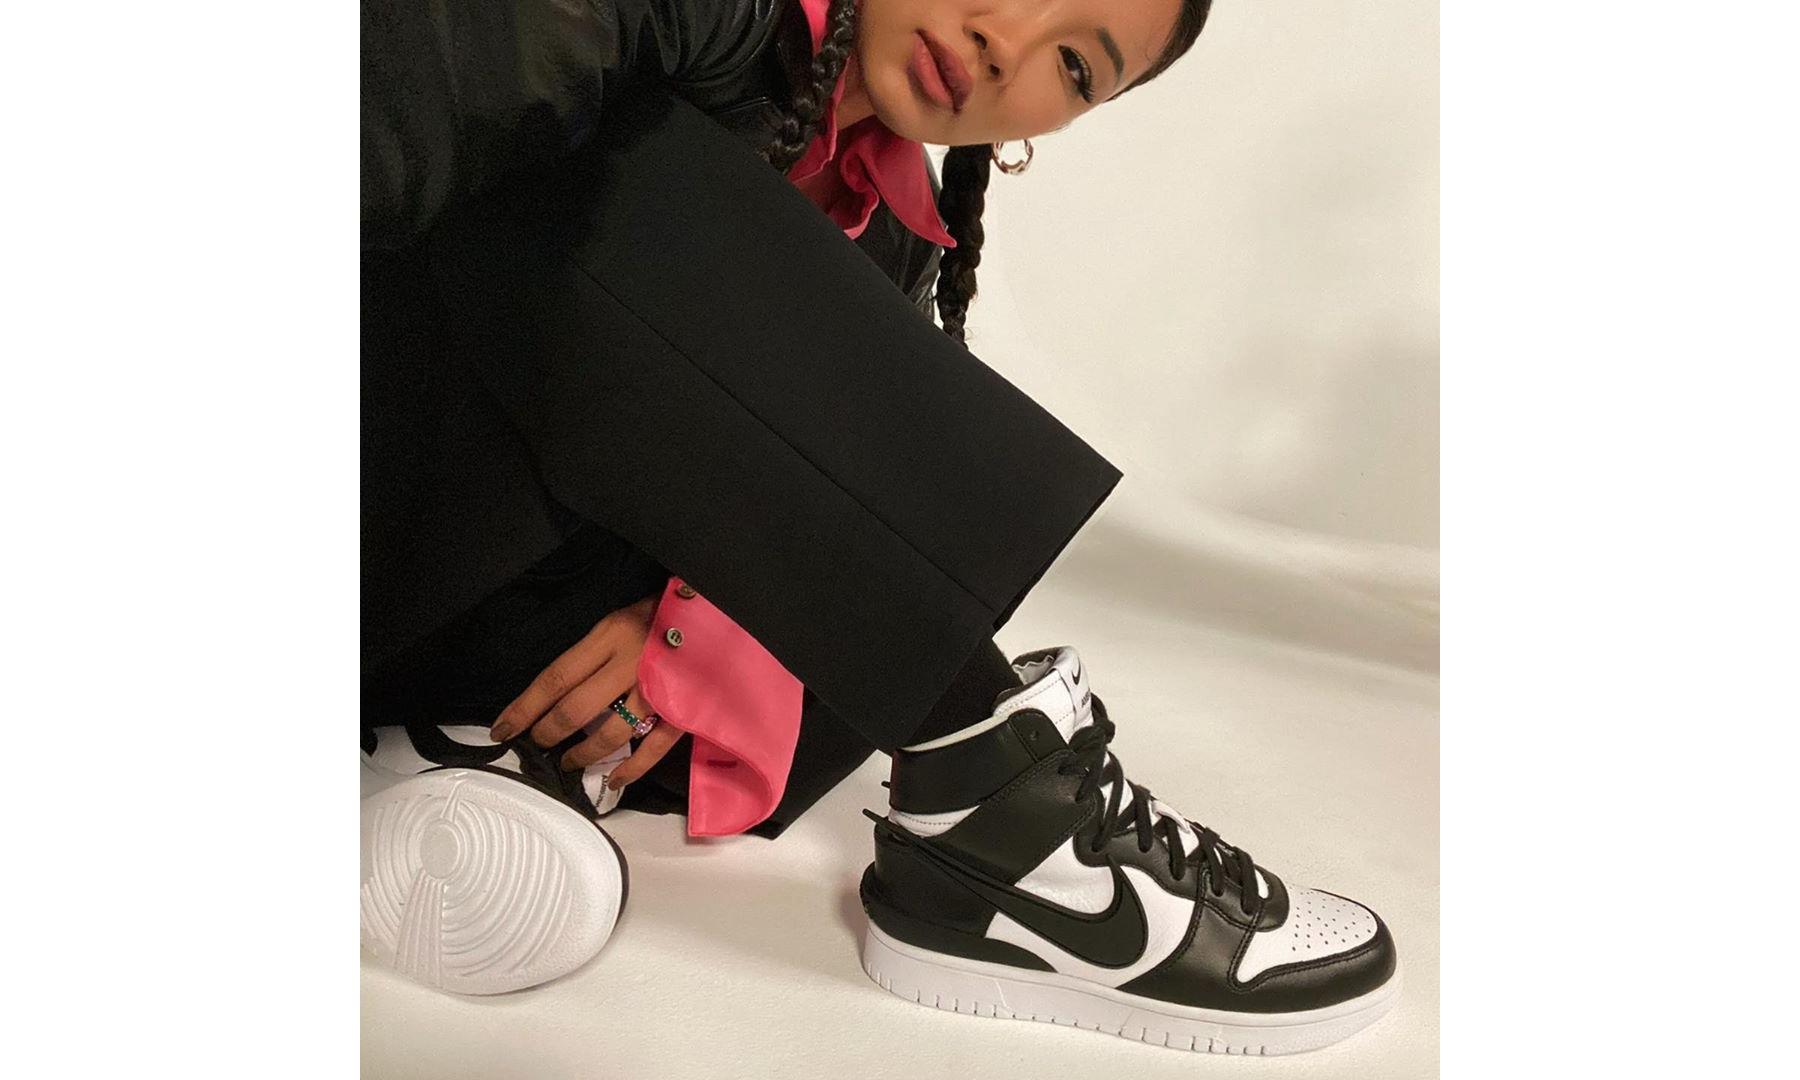 Yoon 亲自揭秘 AMBUSH x Nike SB Dunk High 发售信息